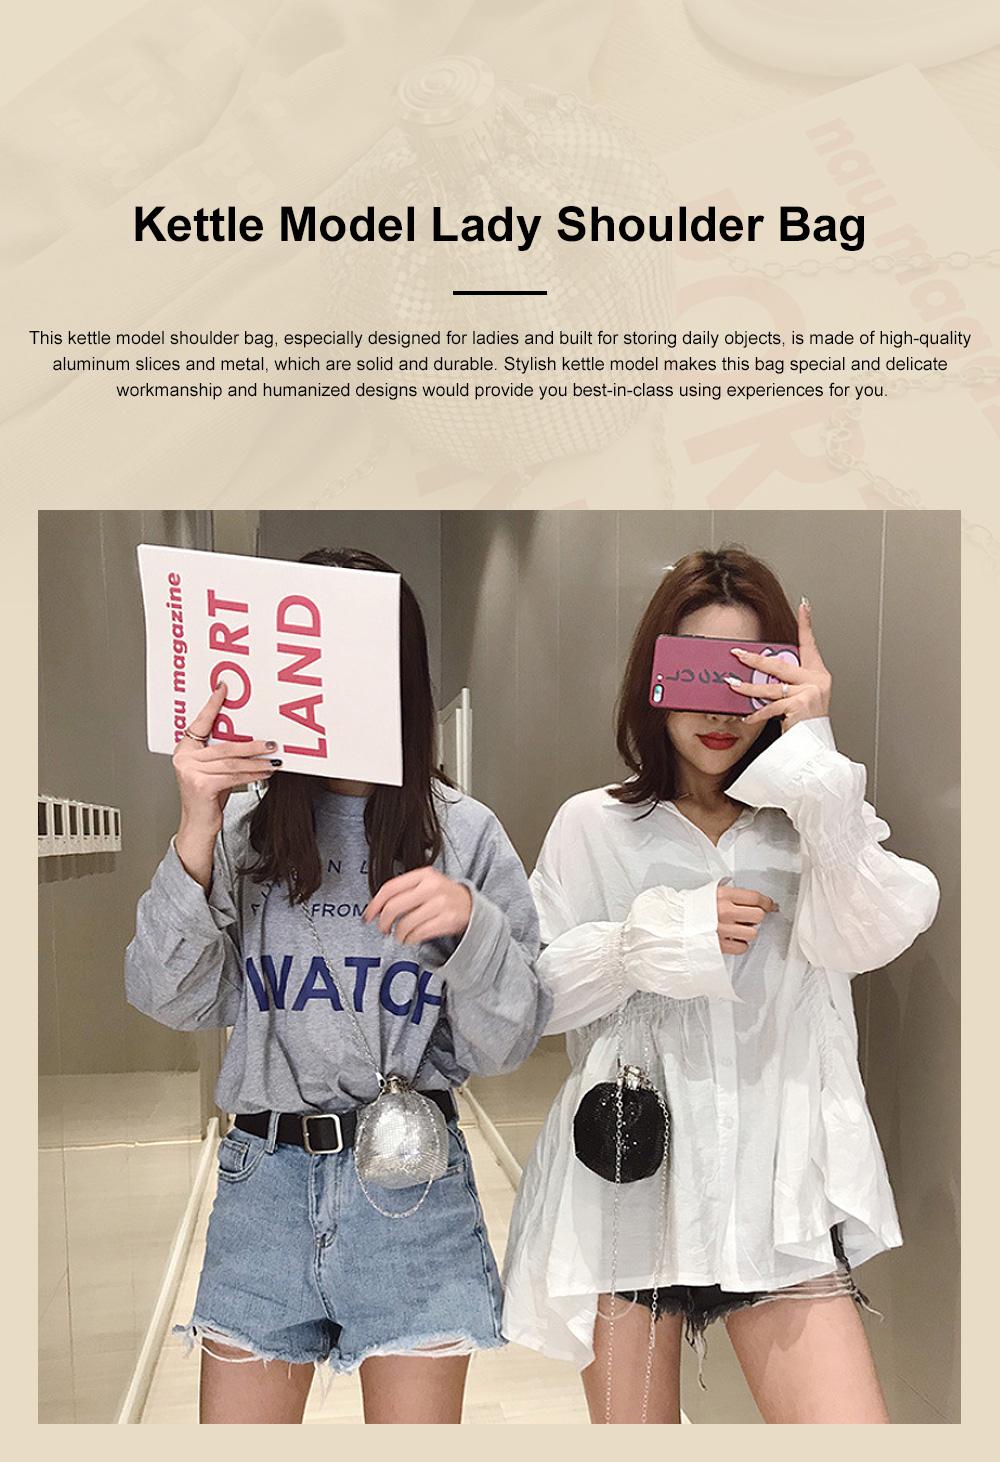 Creative Shiny Aluminum Slices Kettle Model Lady Shoulder Bag, Fashion Stylish Wine Pot Jar Hand Bag for Women 0